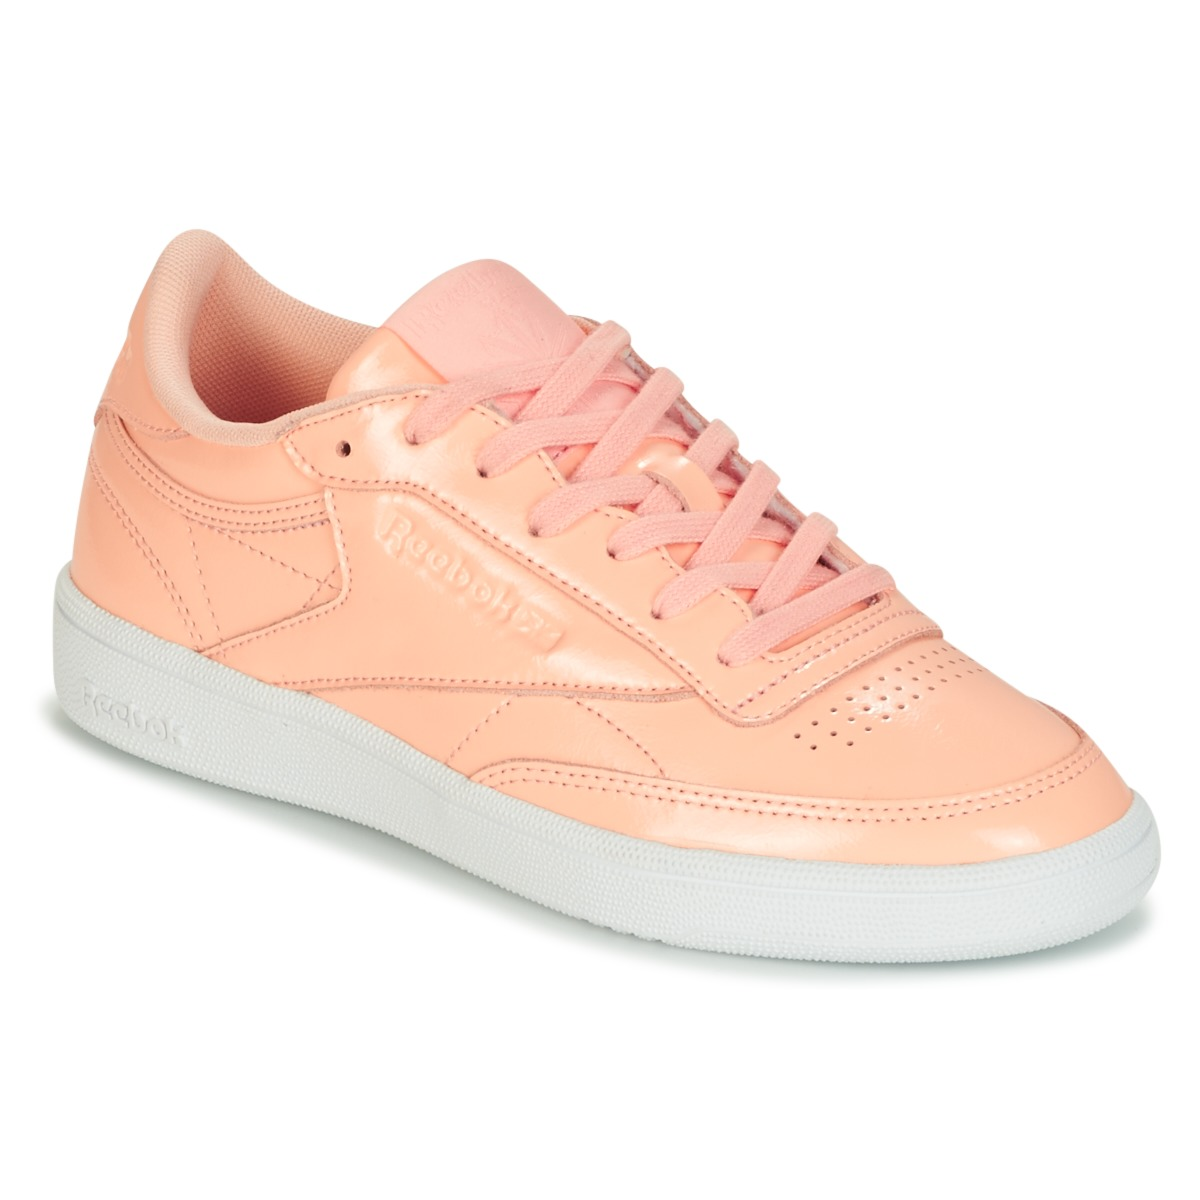 Reebok Classic CLUB C 85 PATENT Rose - Kostenloser Versand bei Spartoode ! - Schuhe Sneaker Low Damen 70,00 €